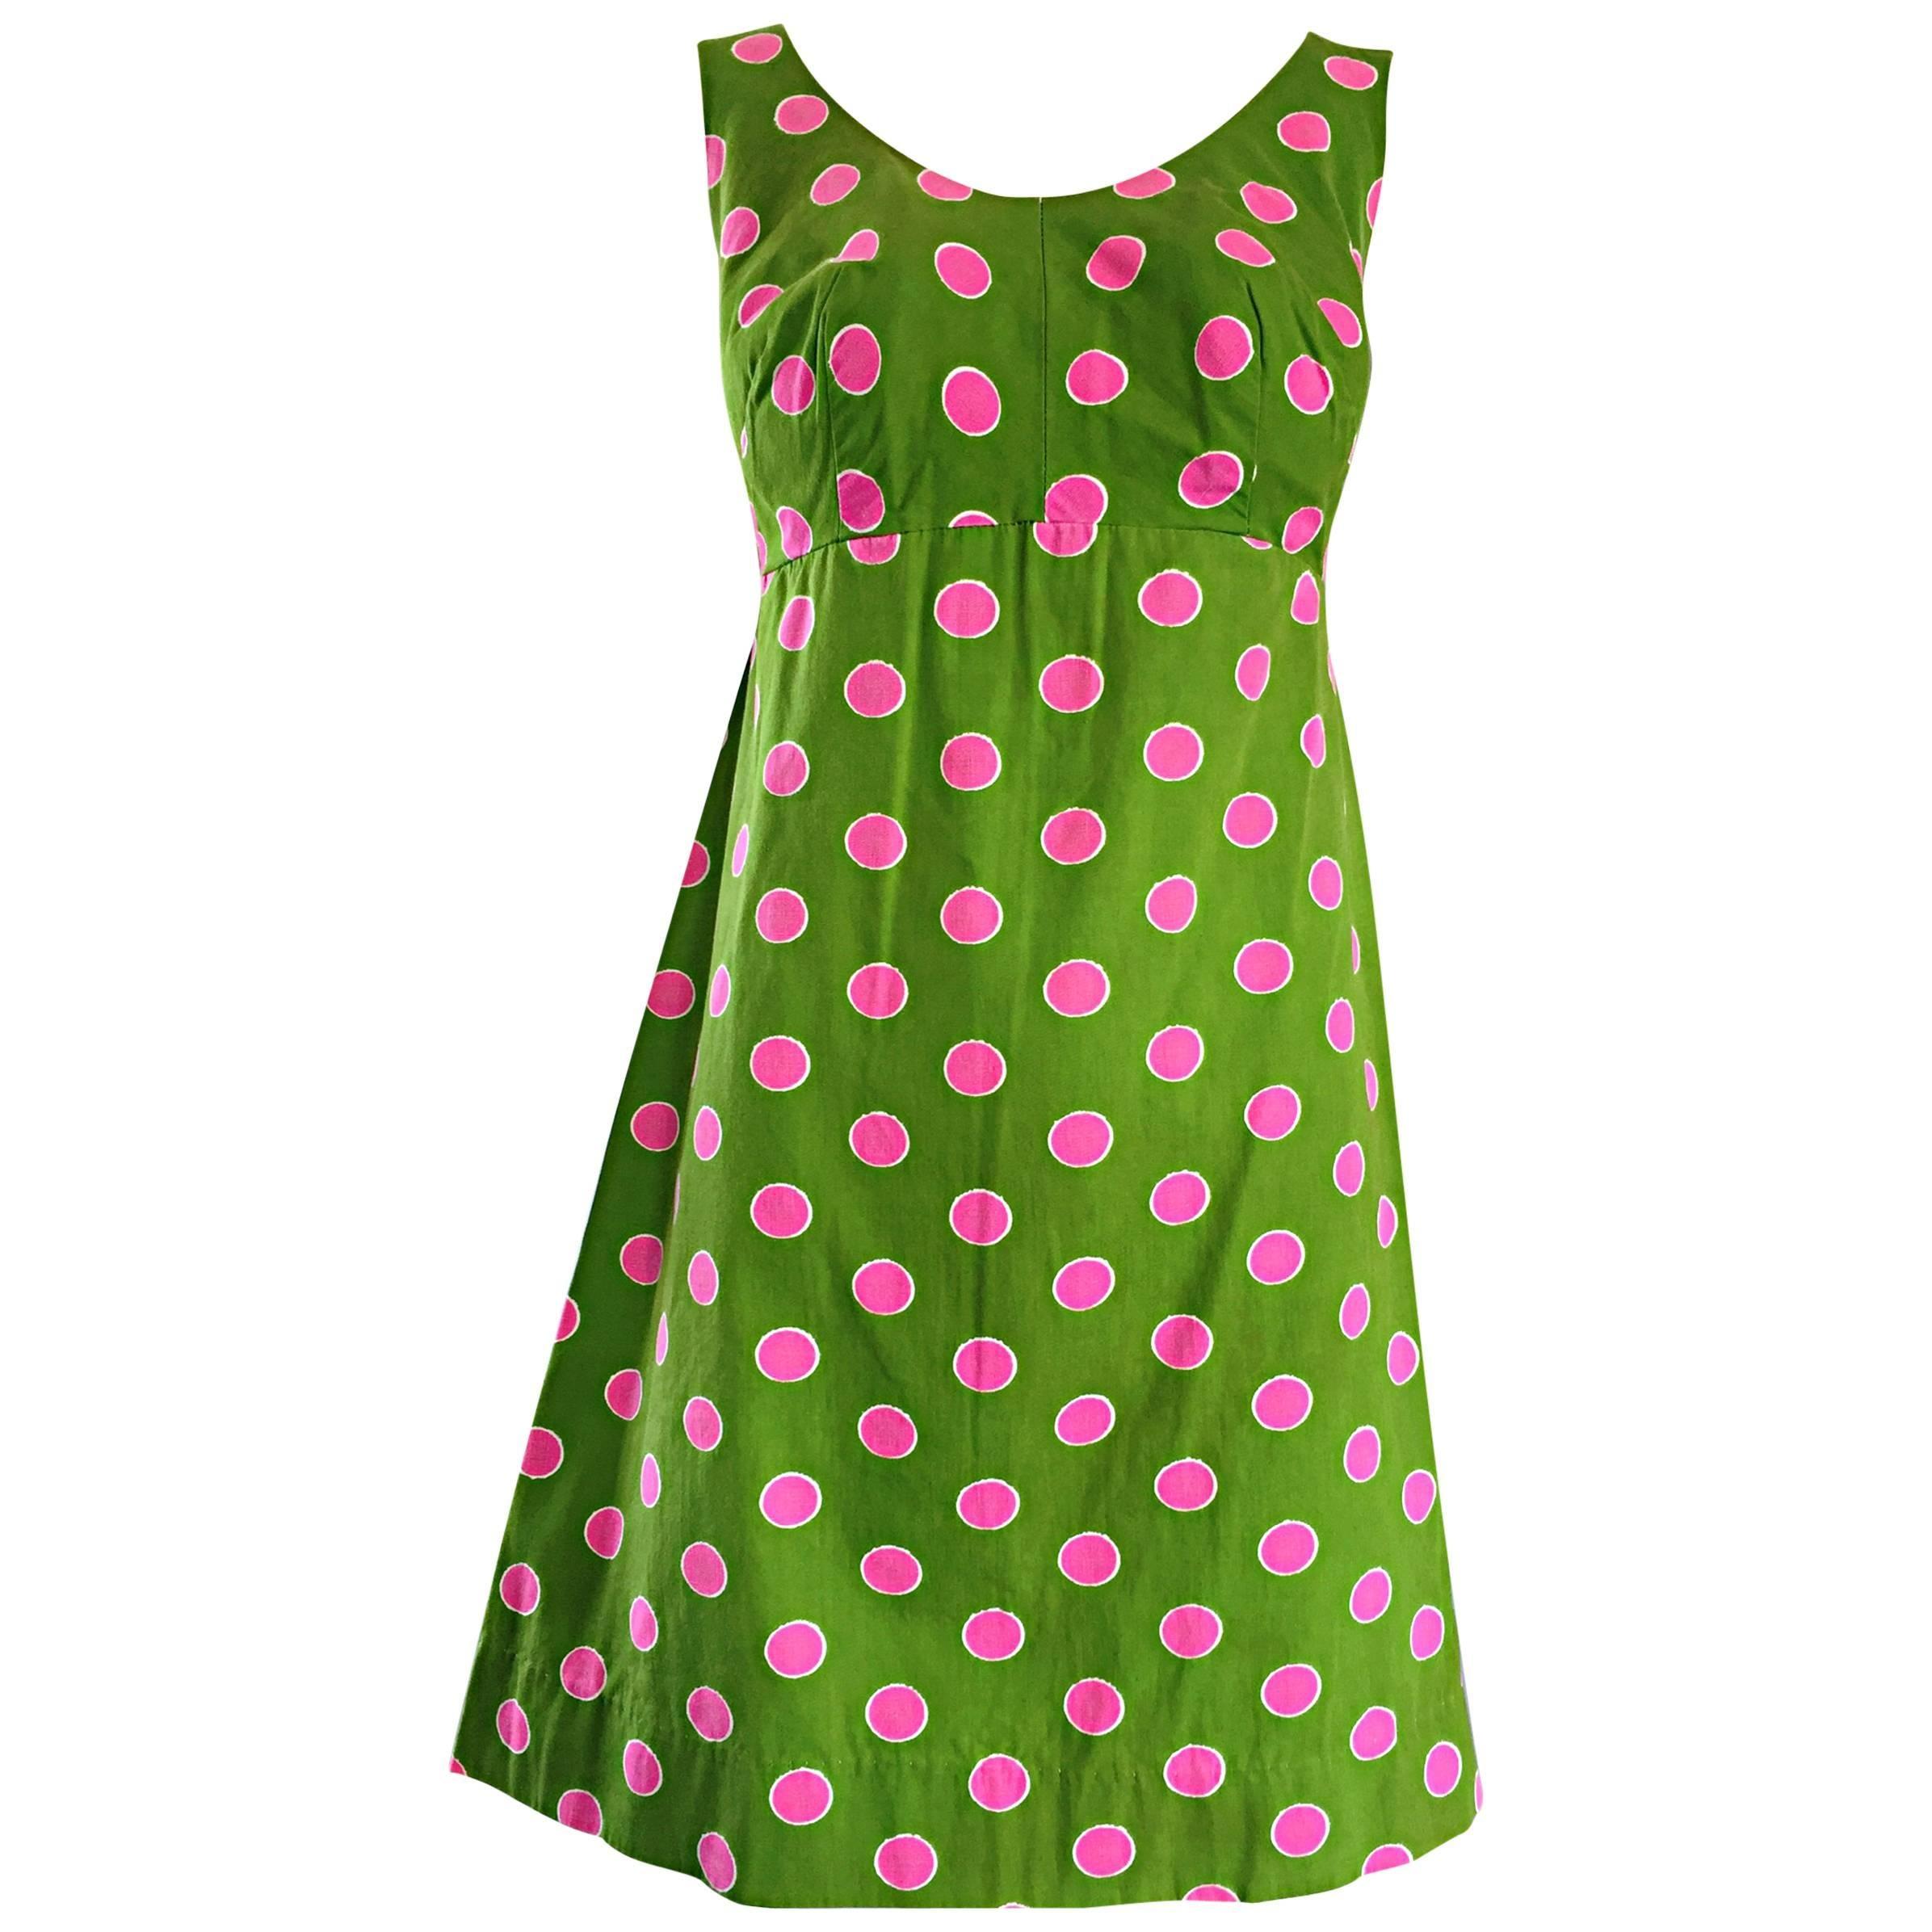 L Vintage 60s Mid Century Polka Dot Print Dress